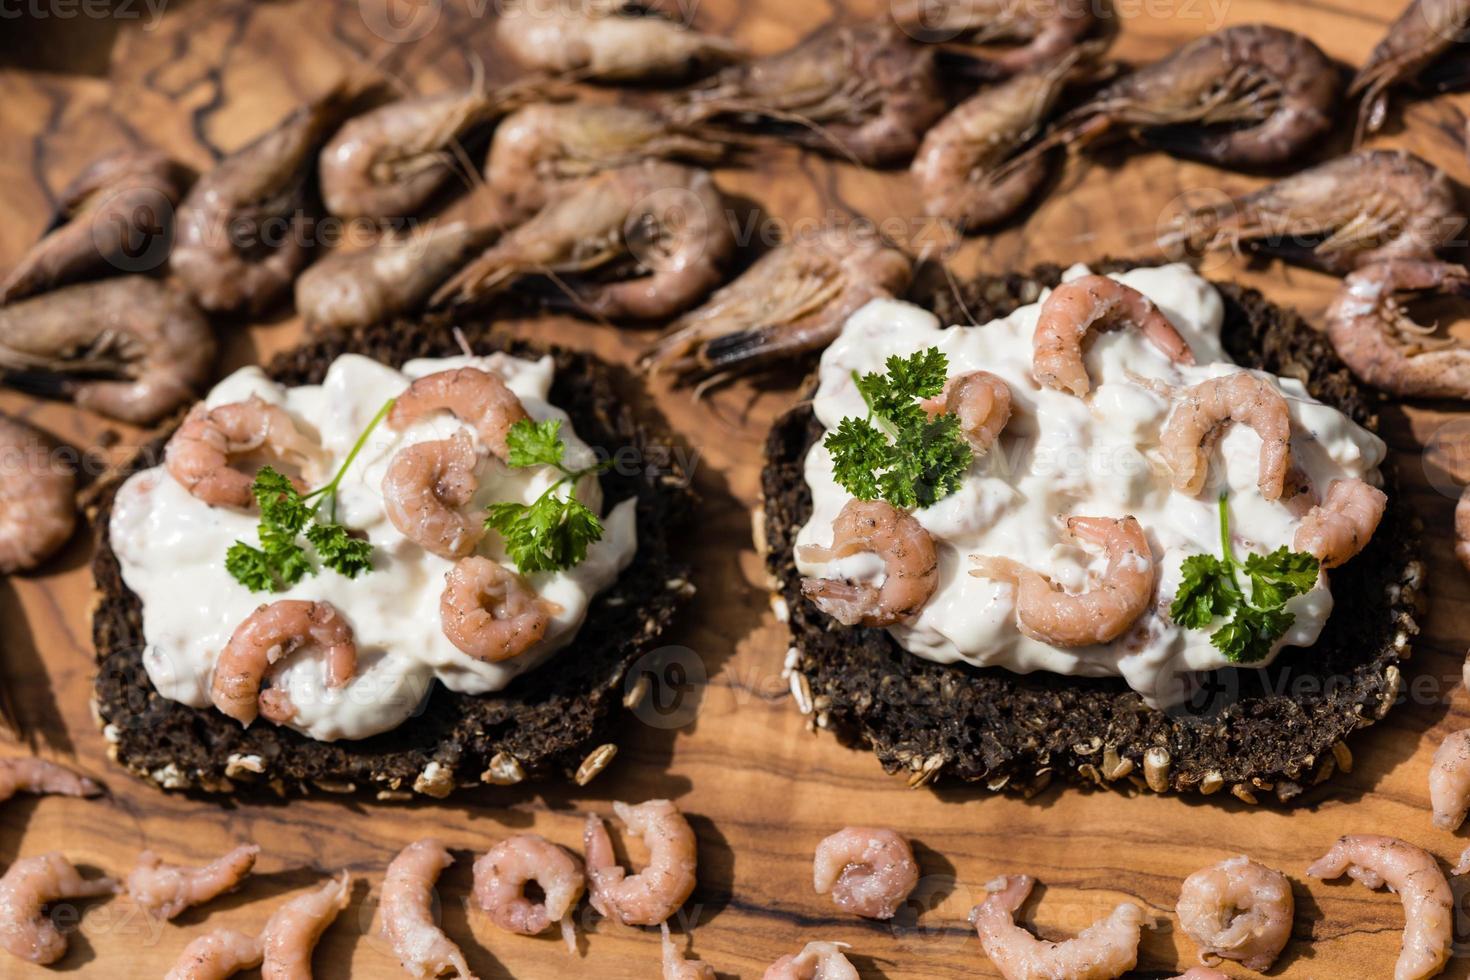 Salad with fresh North Sea crabs photo